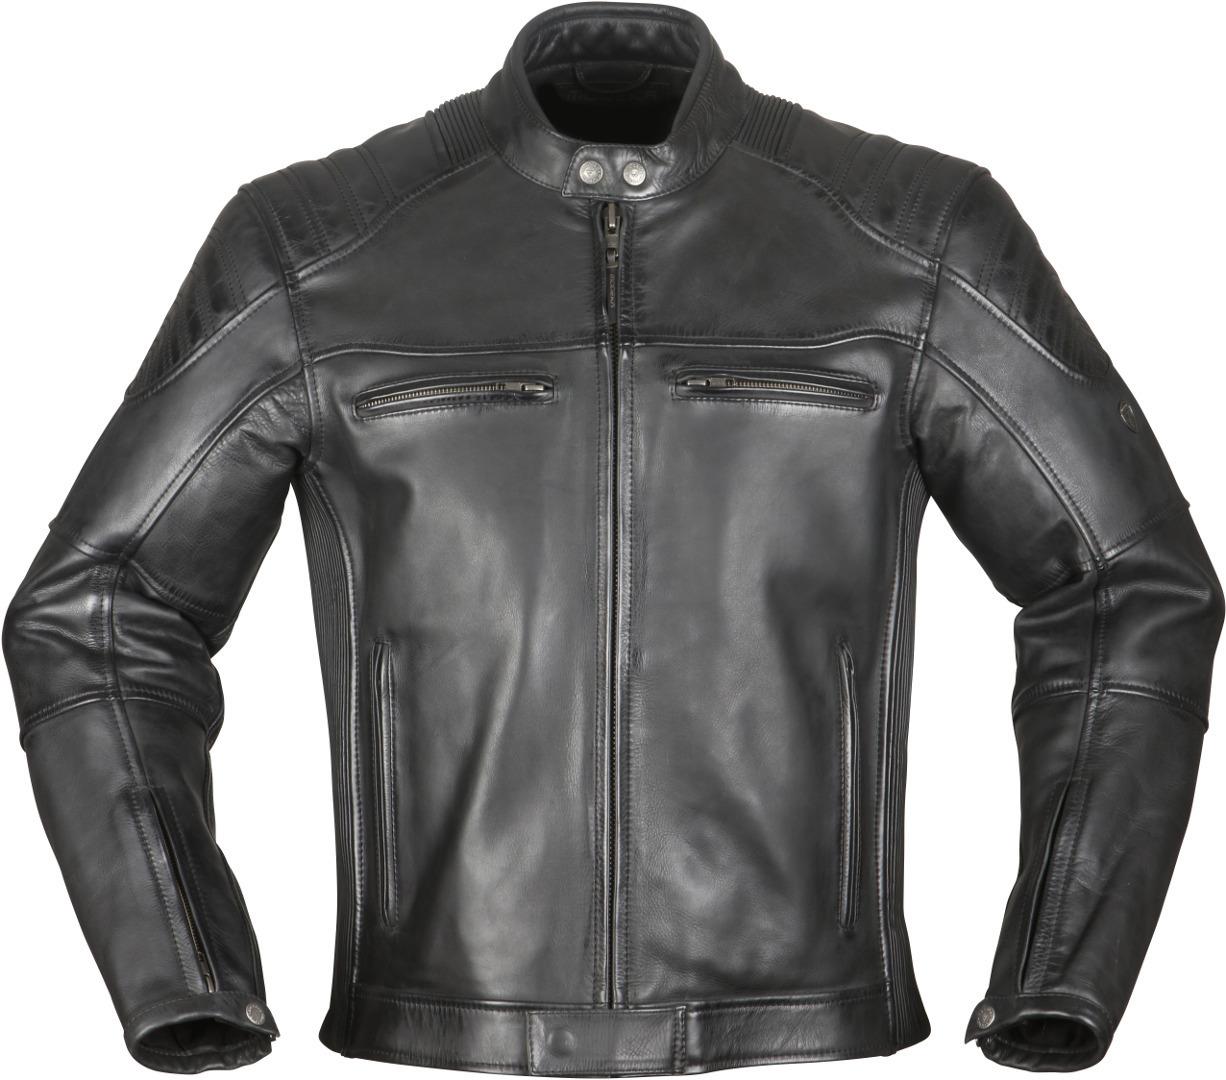 Modeka Vincent Motorrad Lederjacke, schwarz, Größe 2XL, schwarz, Größe 2XL